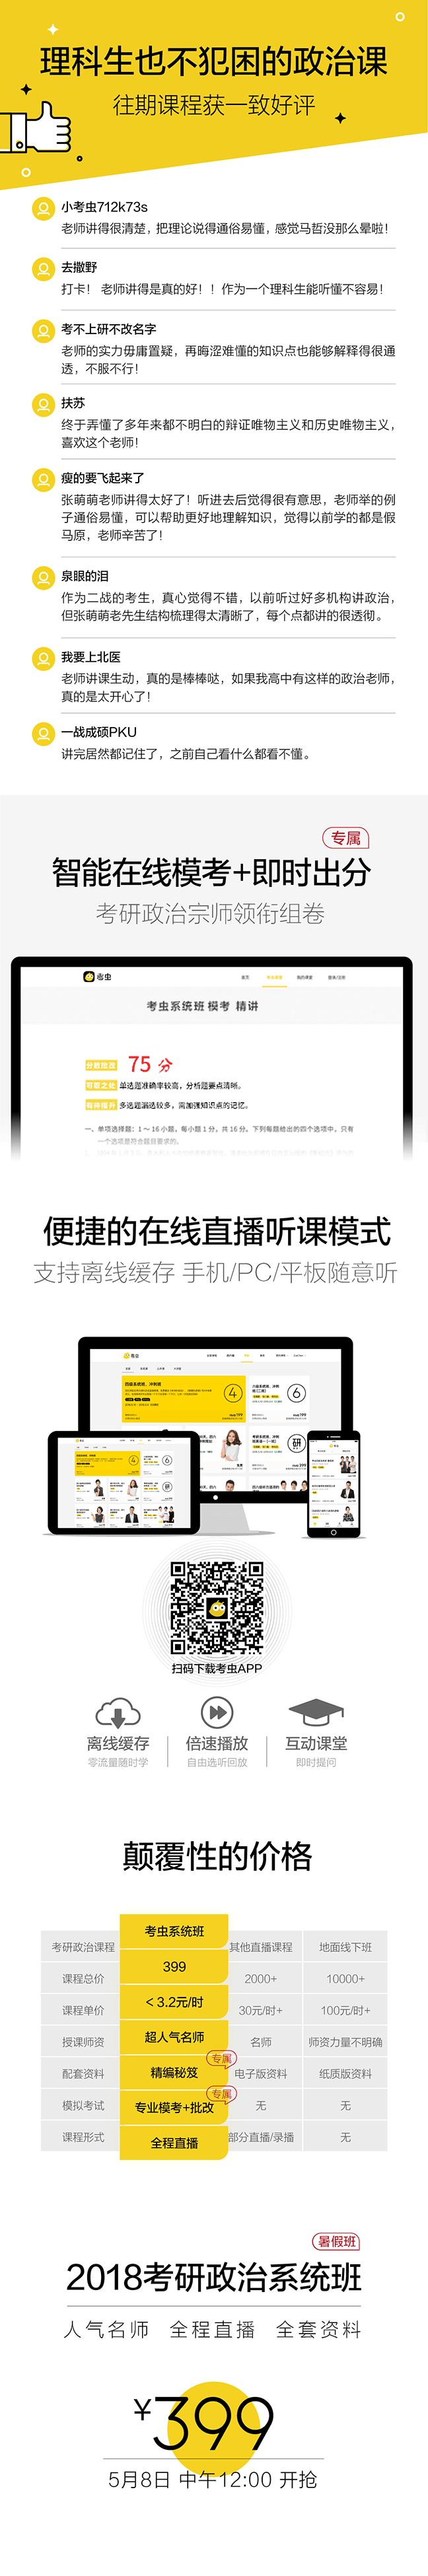 考研18政治-03.png